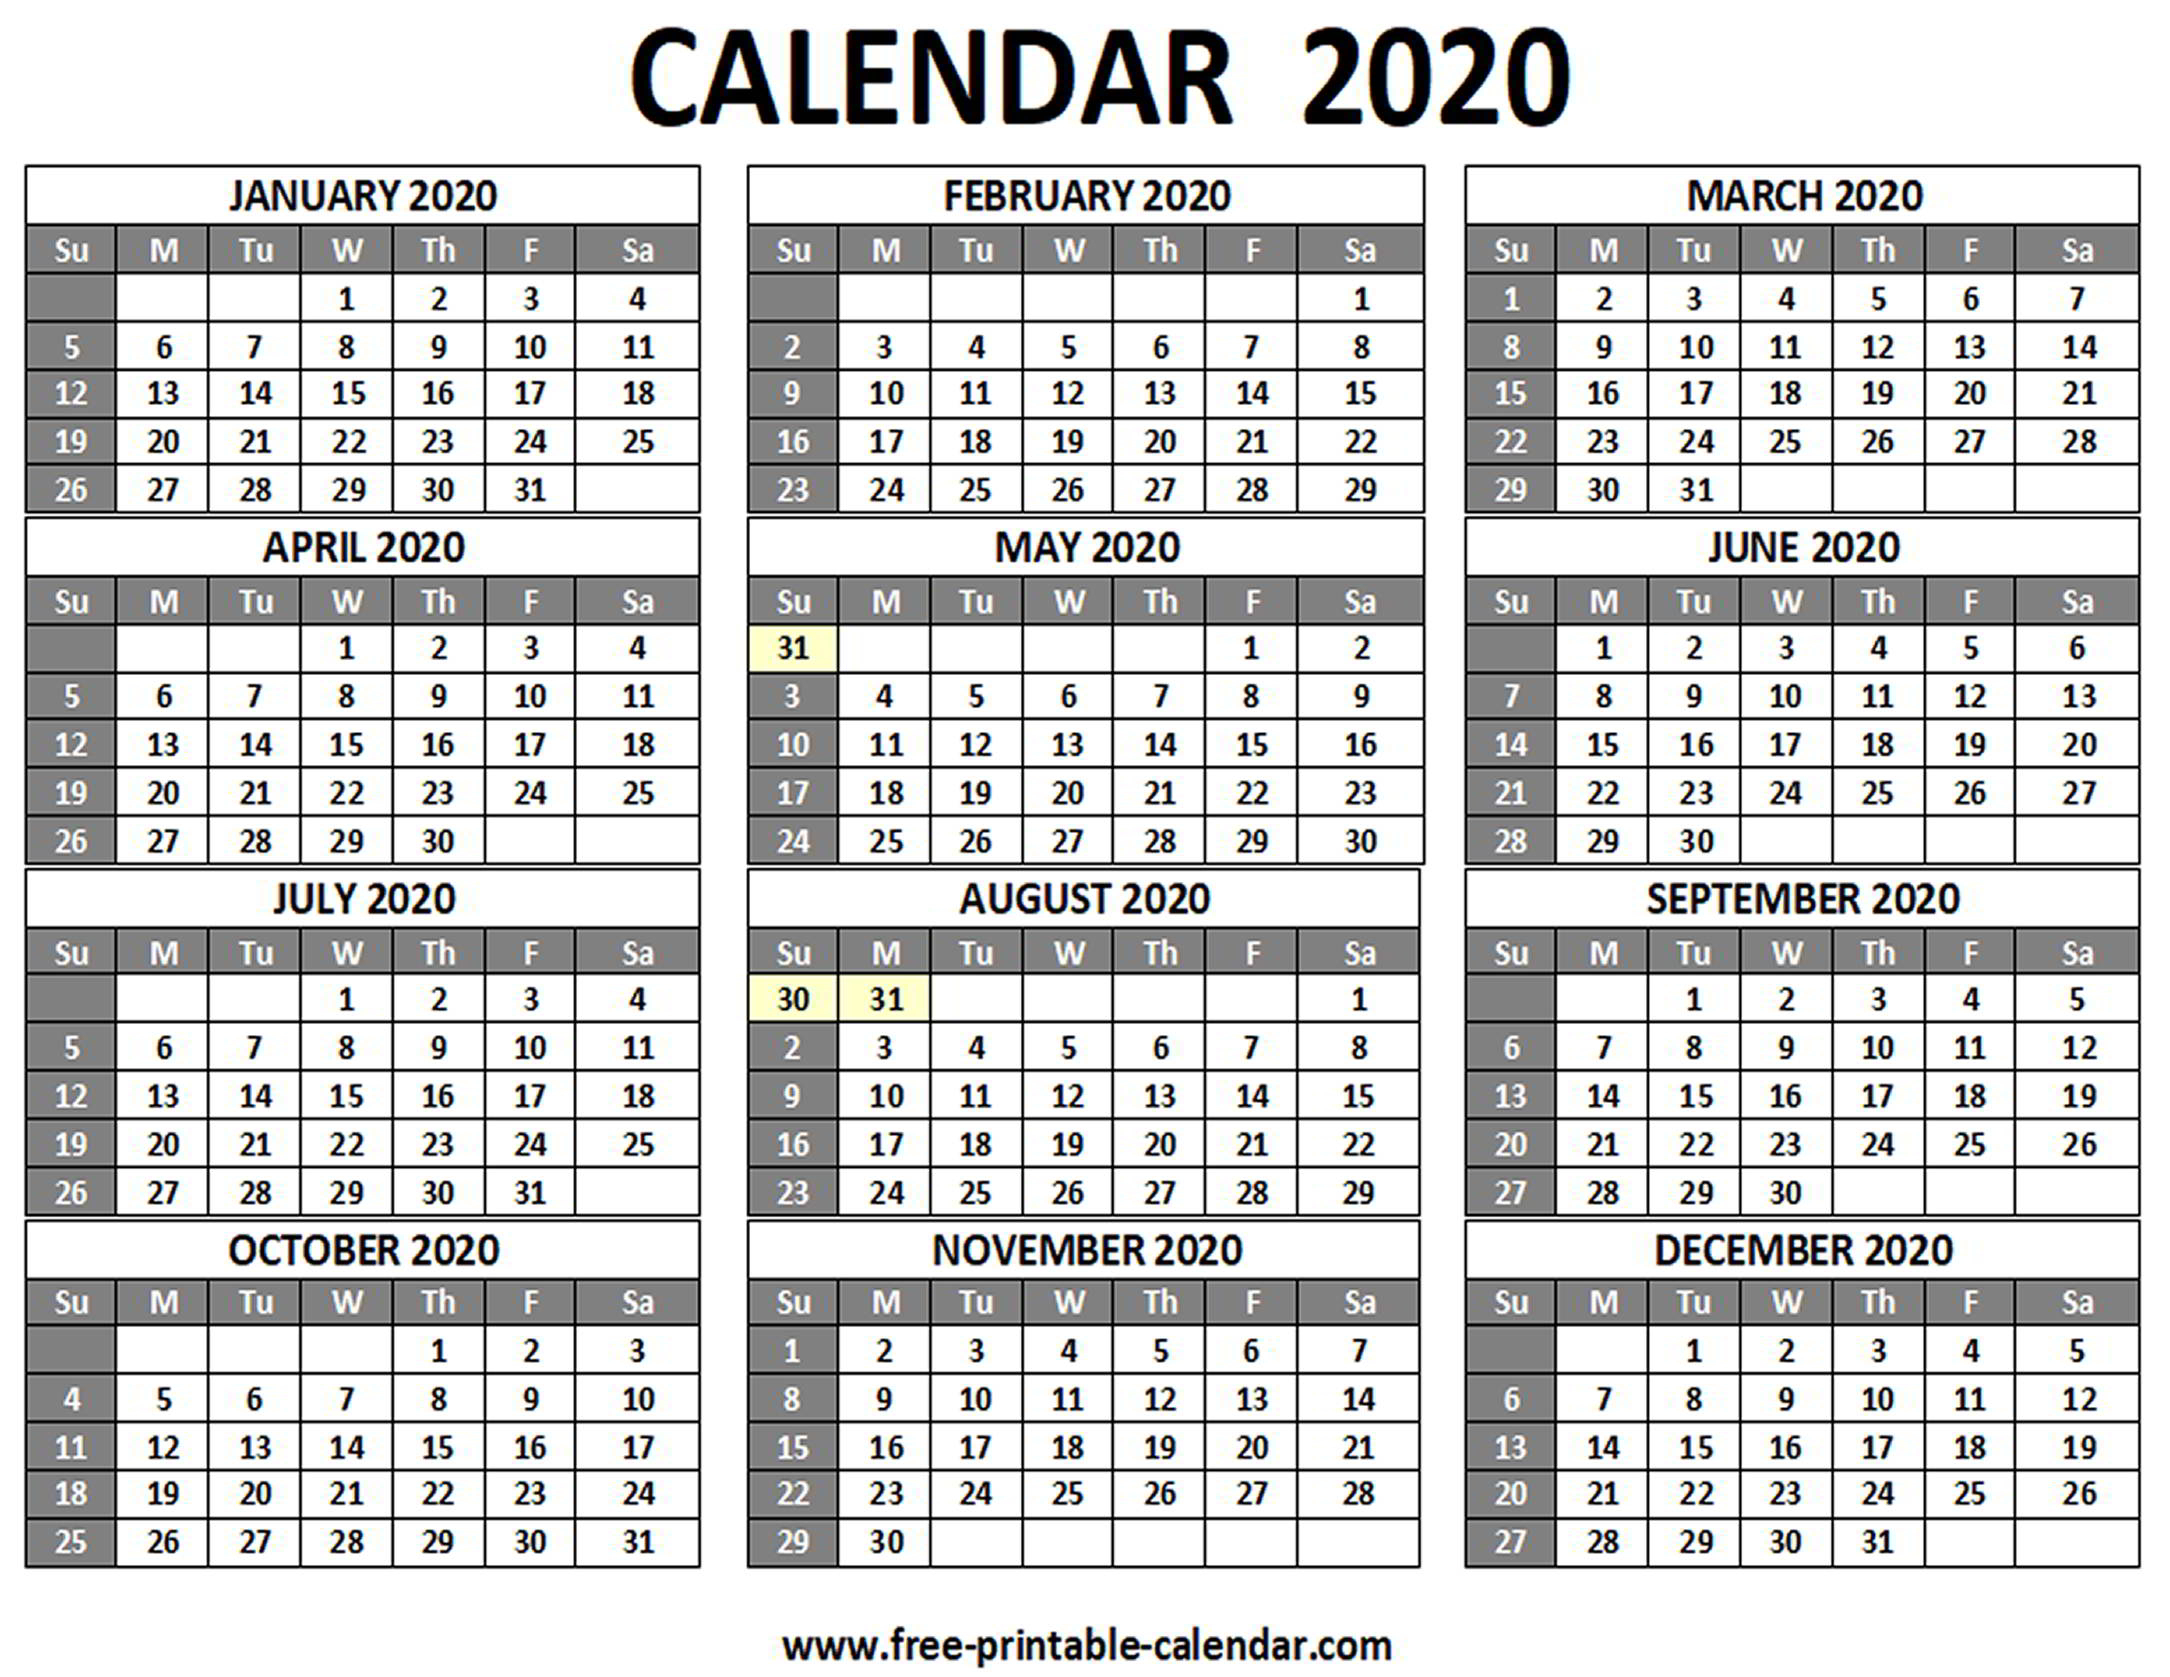 Printable 2020 Calendar - Free-Printable-Calendar with Free Printable 2020 Canadian Calendar